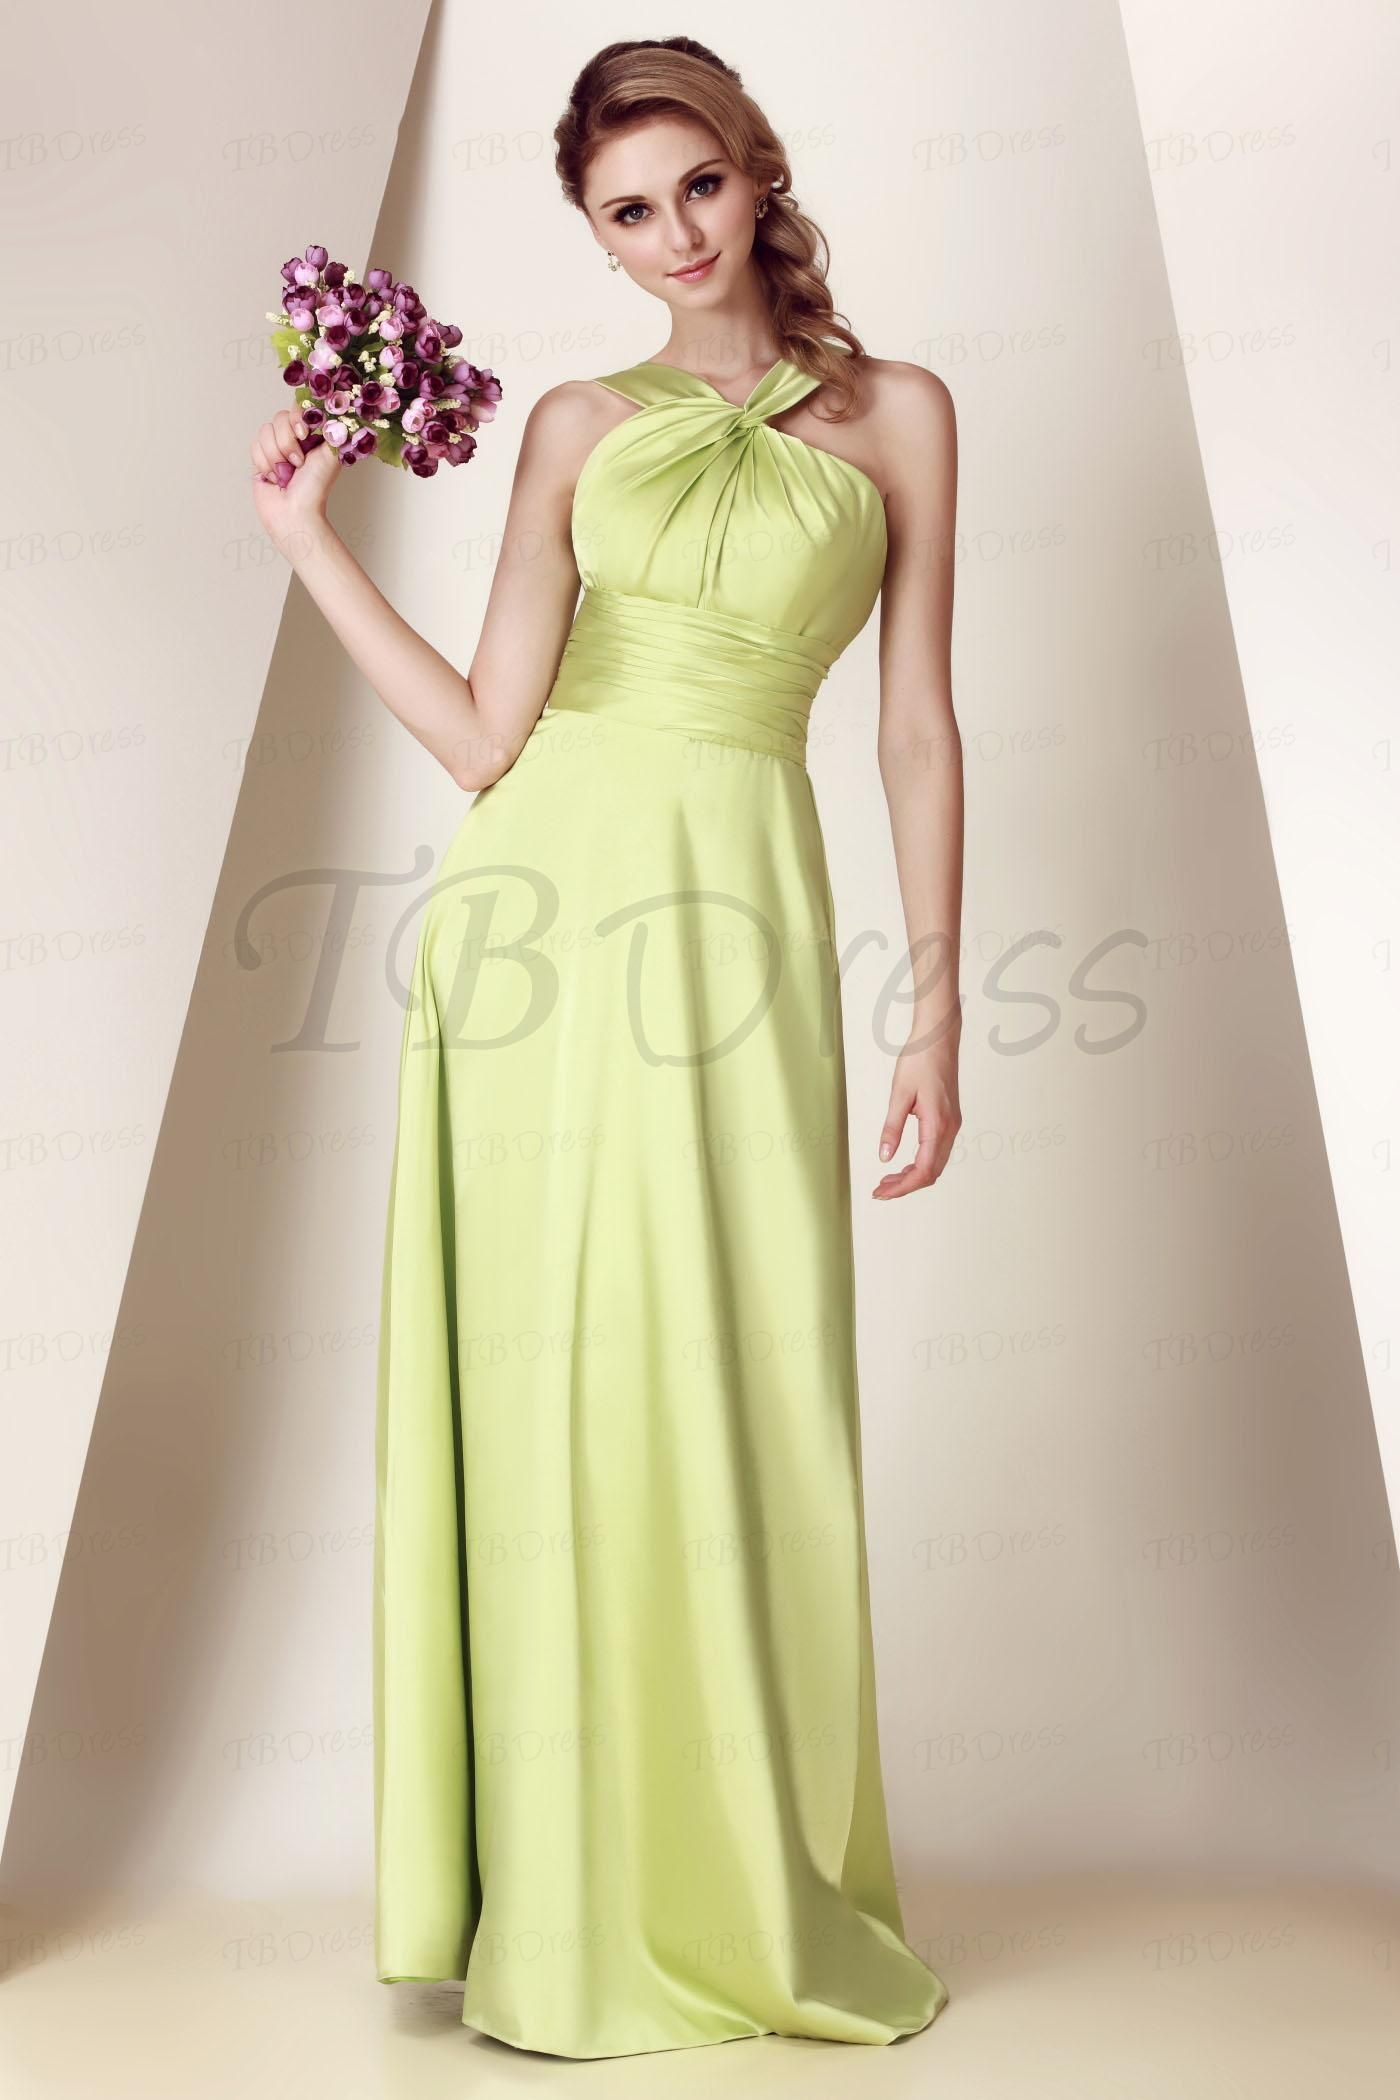 6a62e8bc63 Charming Ruched A-Line Straps Floor-Length Dasha s Bridesmaid Dress